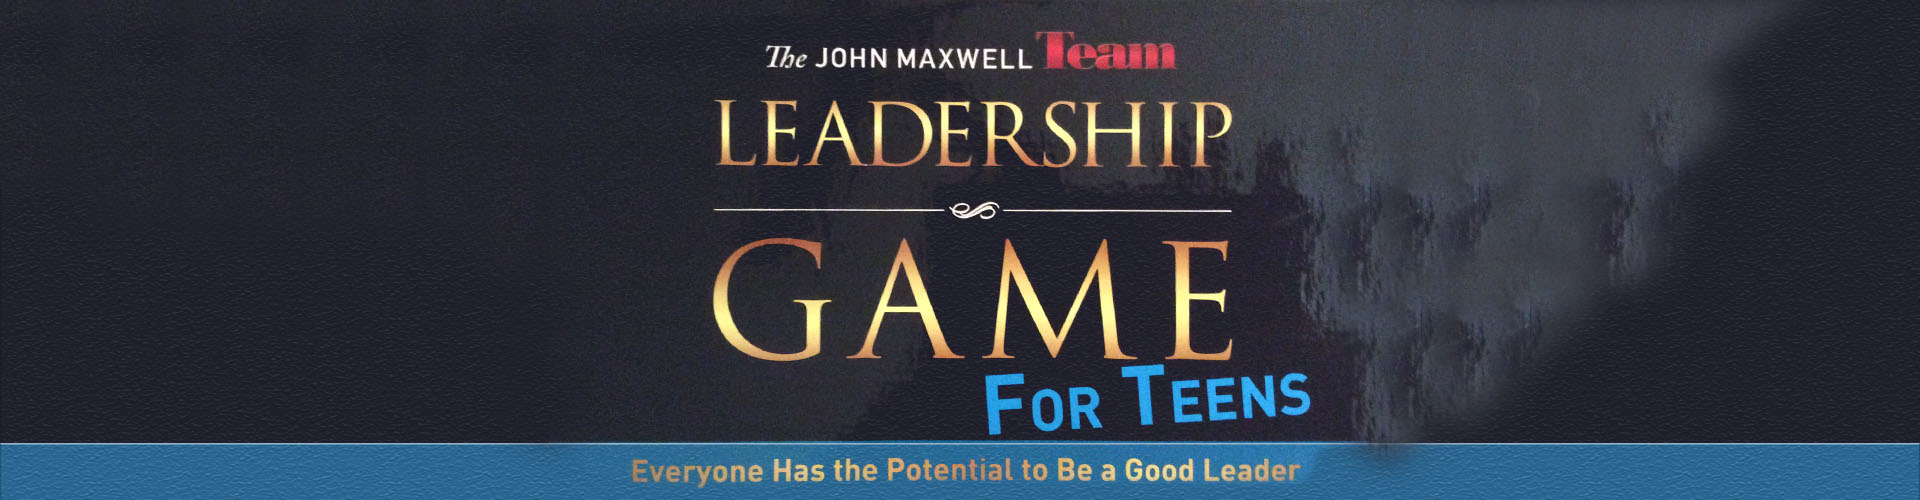 LEADERSHIP GAME FOR TEENS